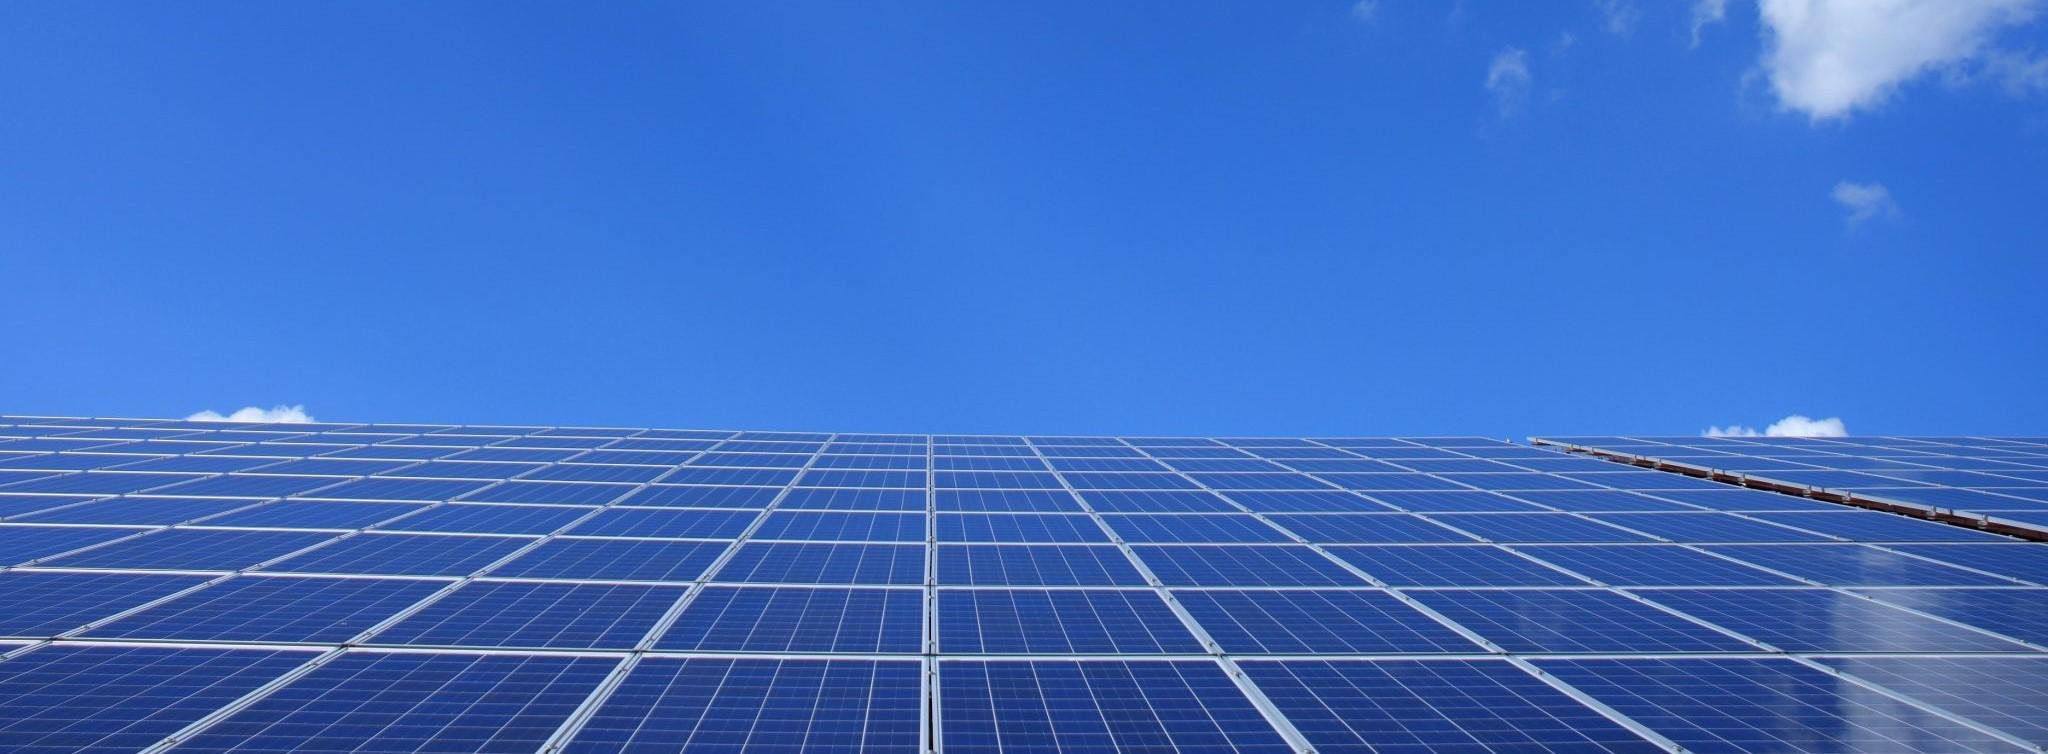 naya energy solar panels, arizona